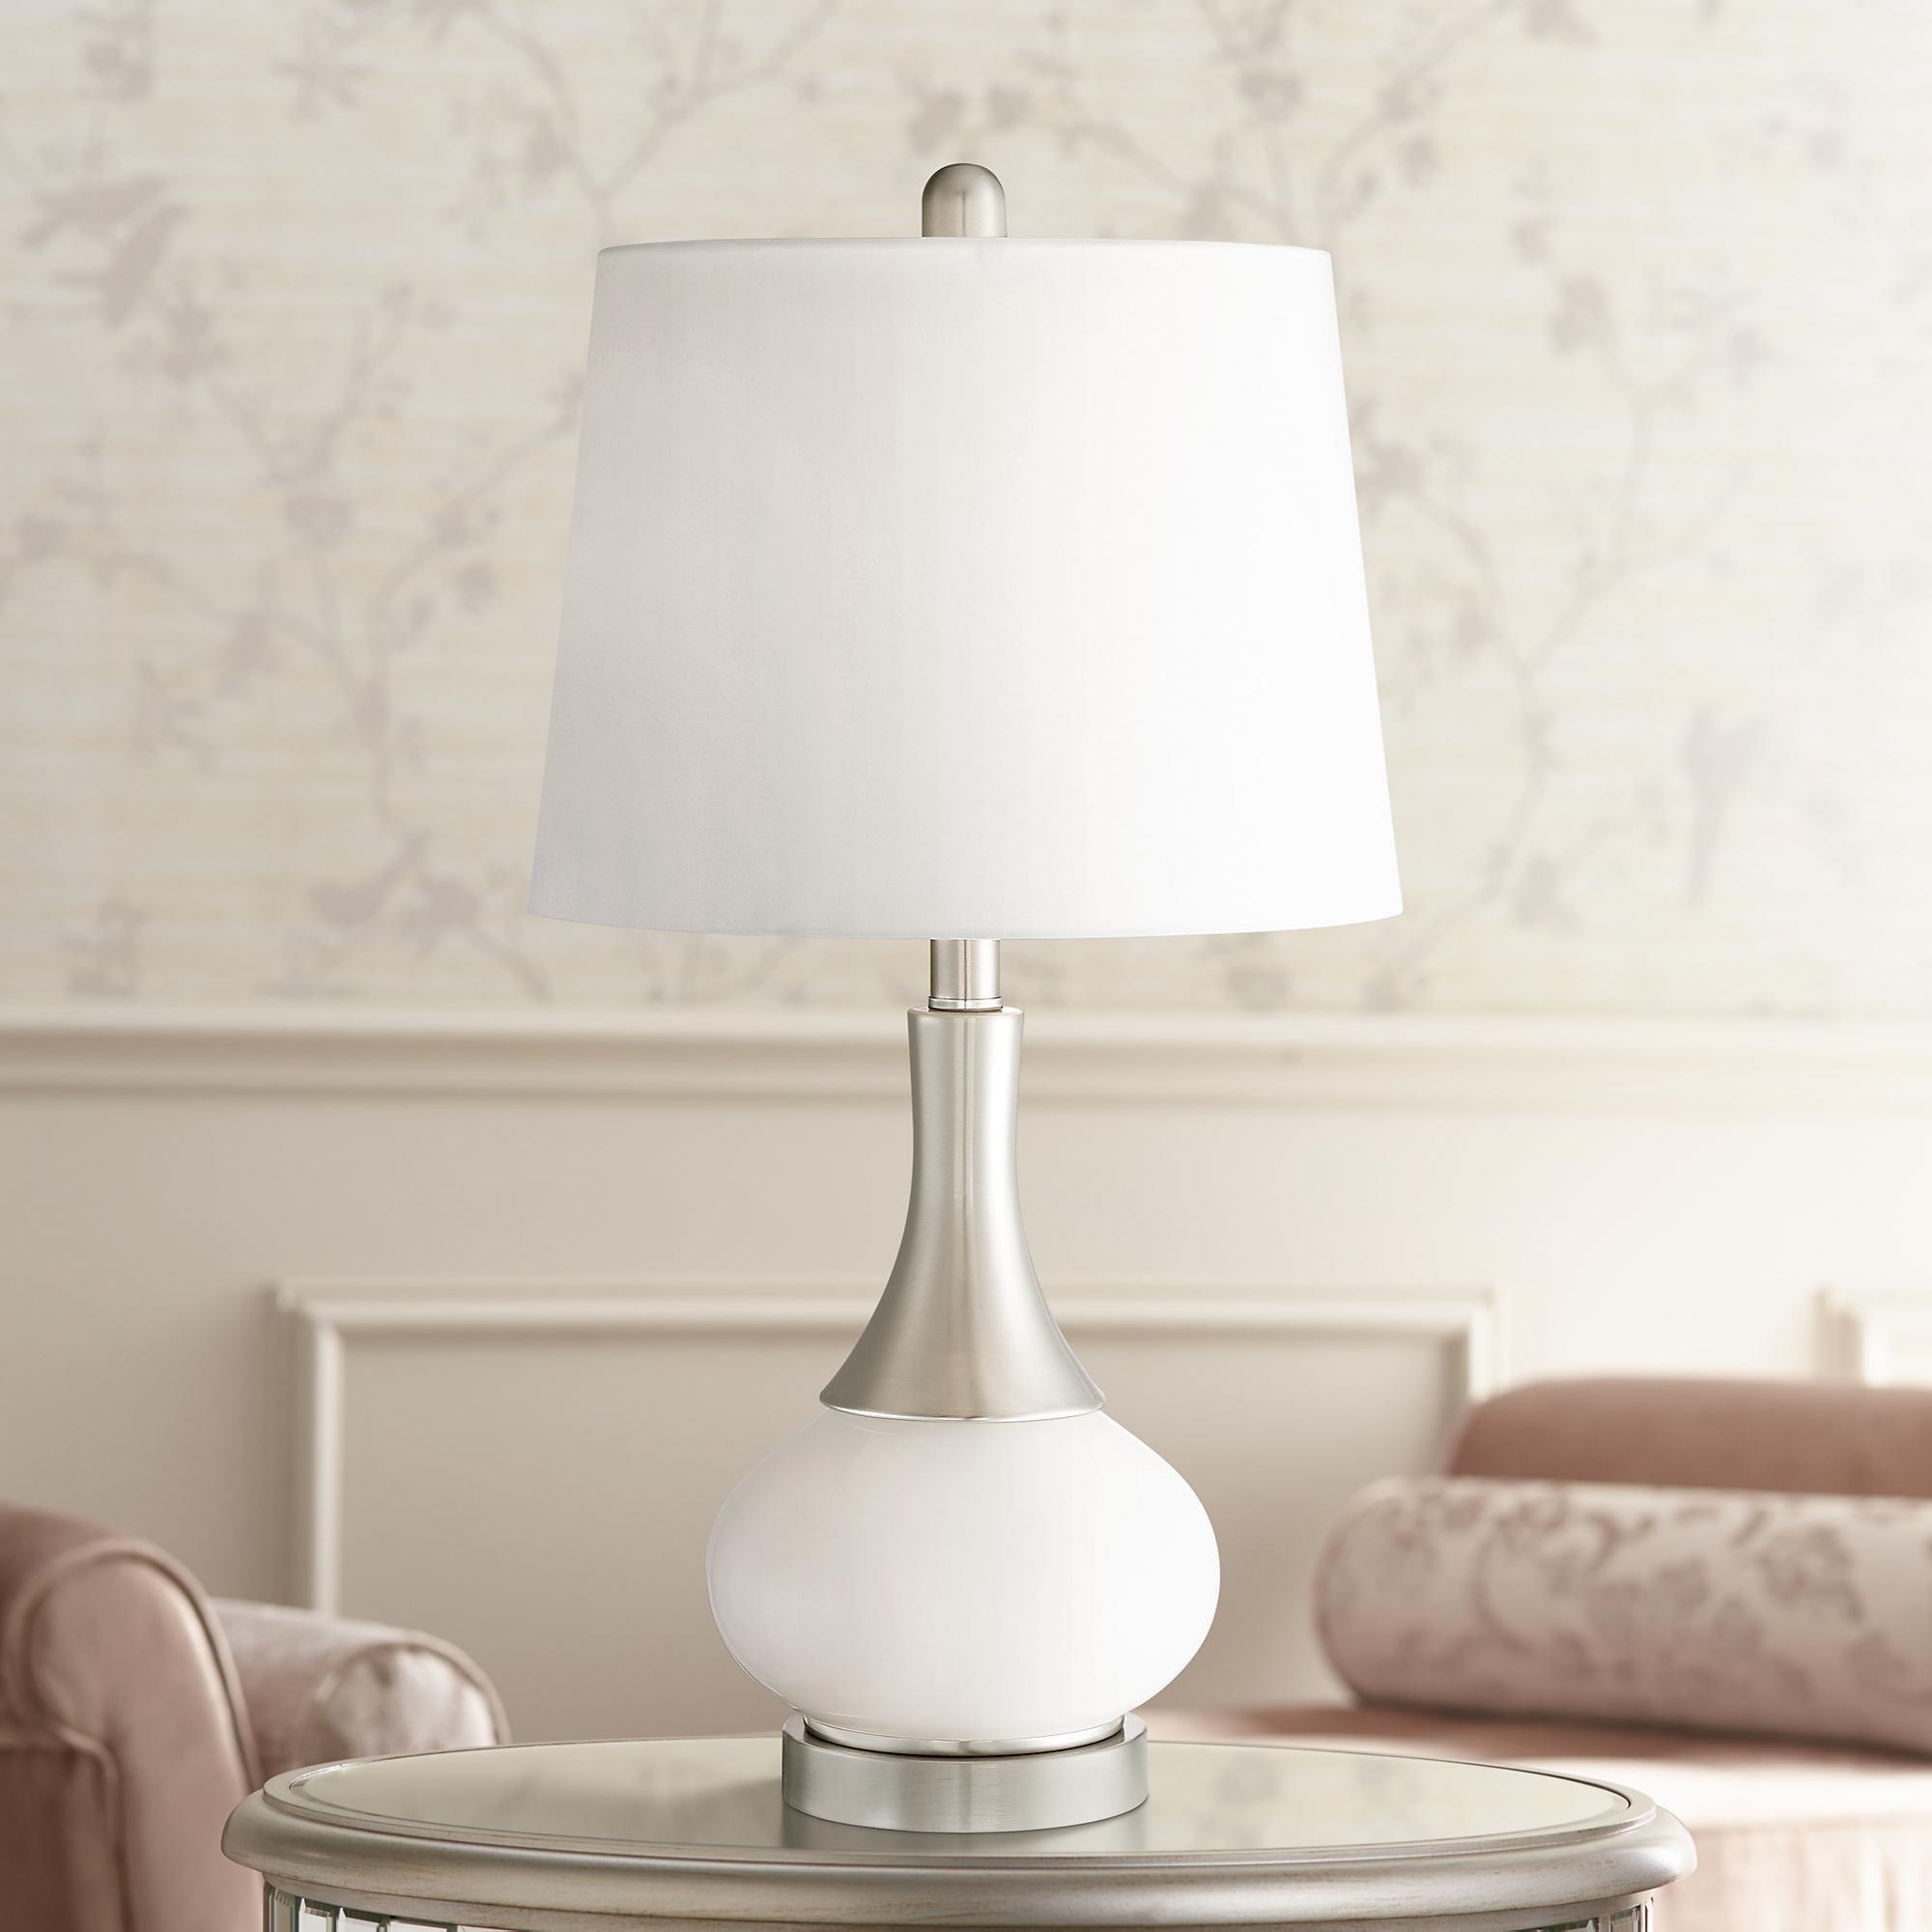 Serrena White Glass Night Light Table Lamp   Table lamp